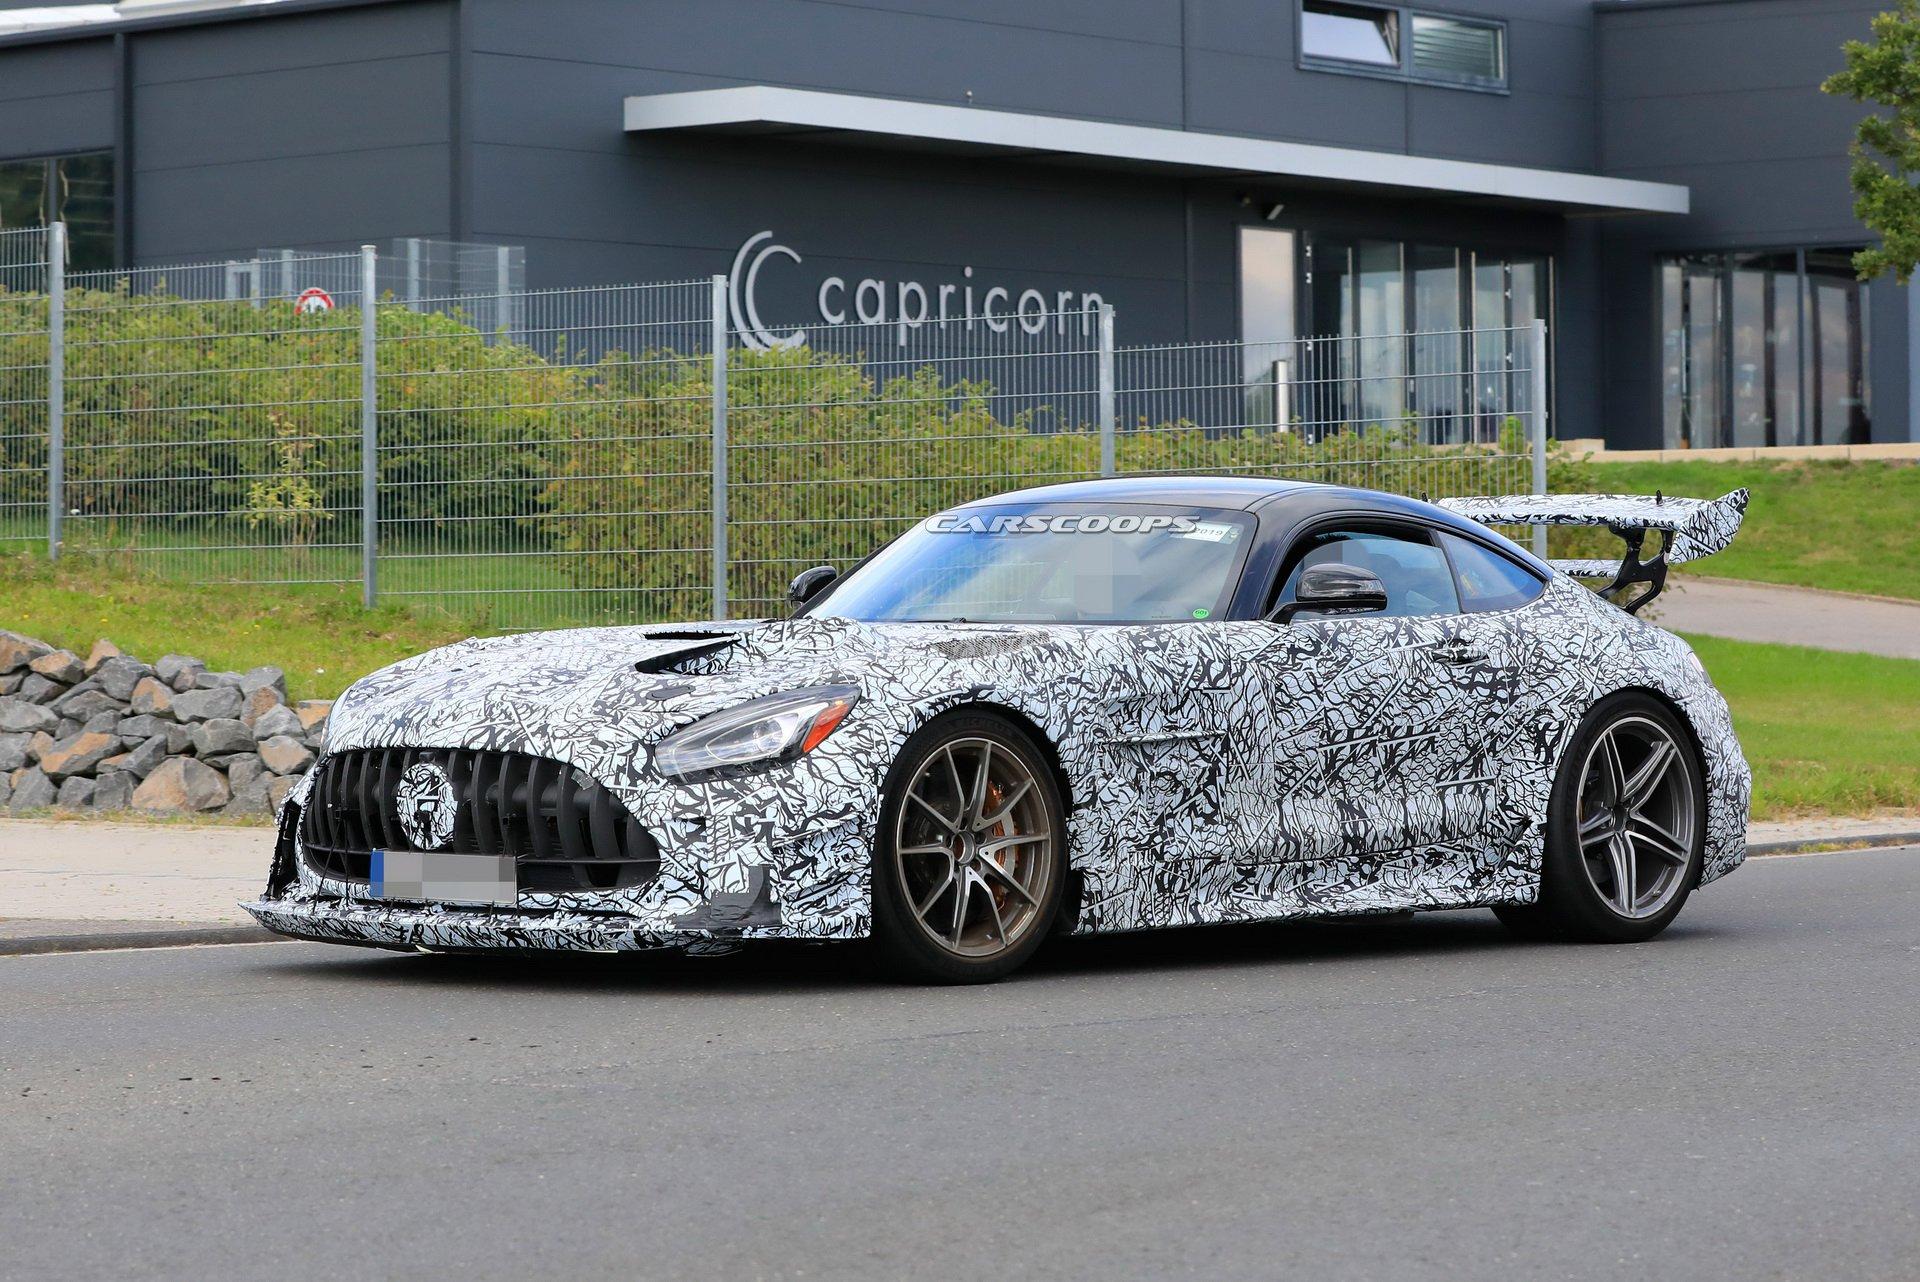 Nuova Mercedes-AMG GT R Black Series design finale